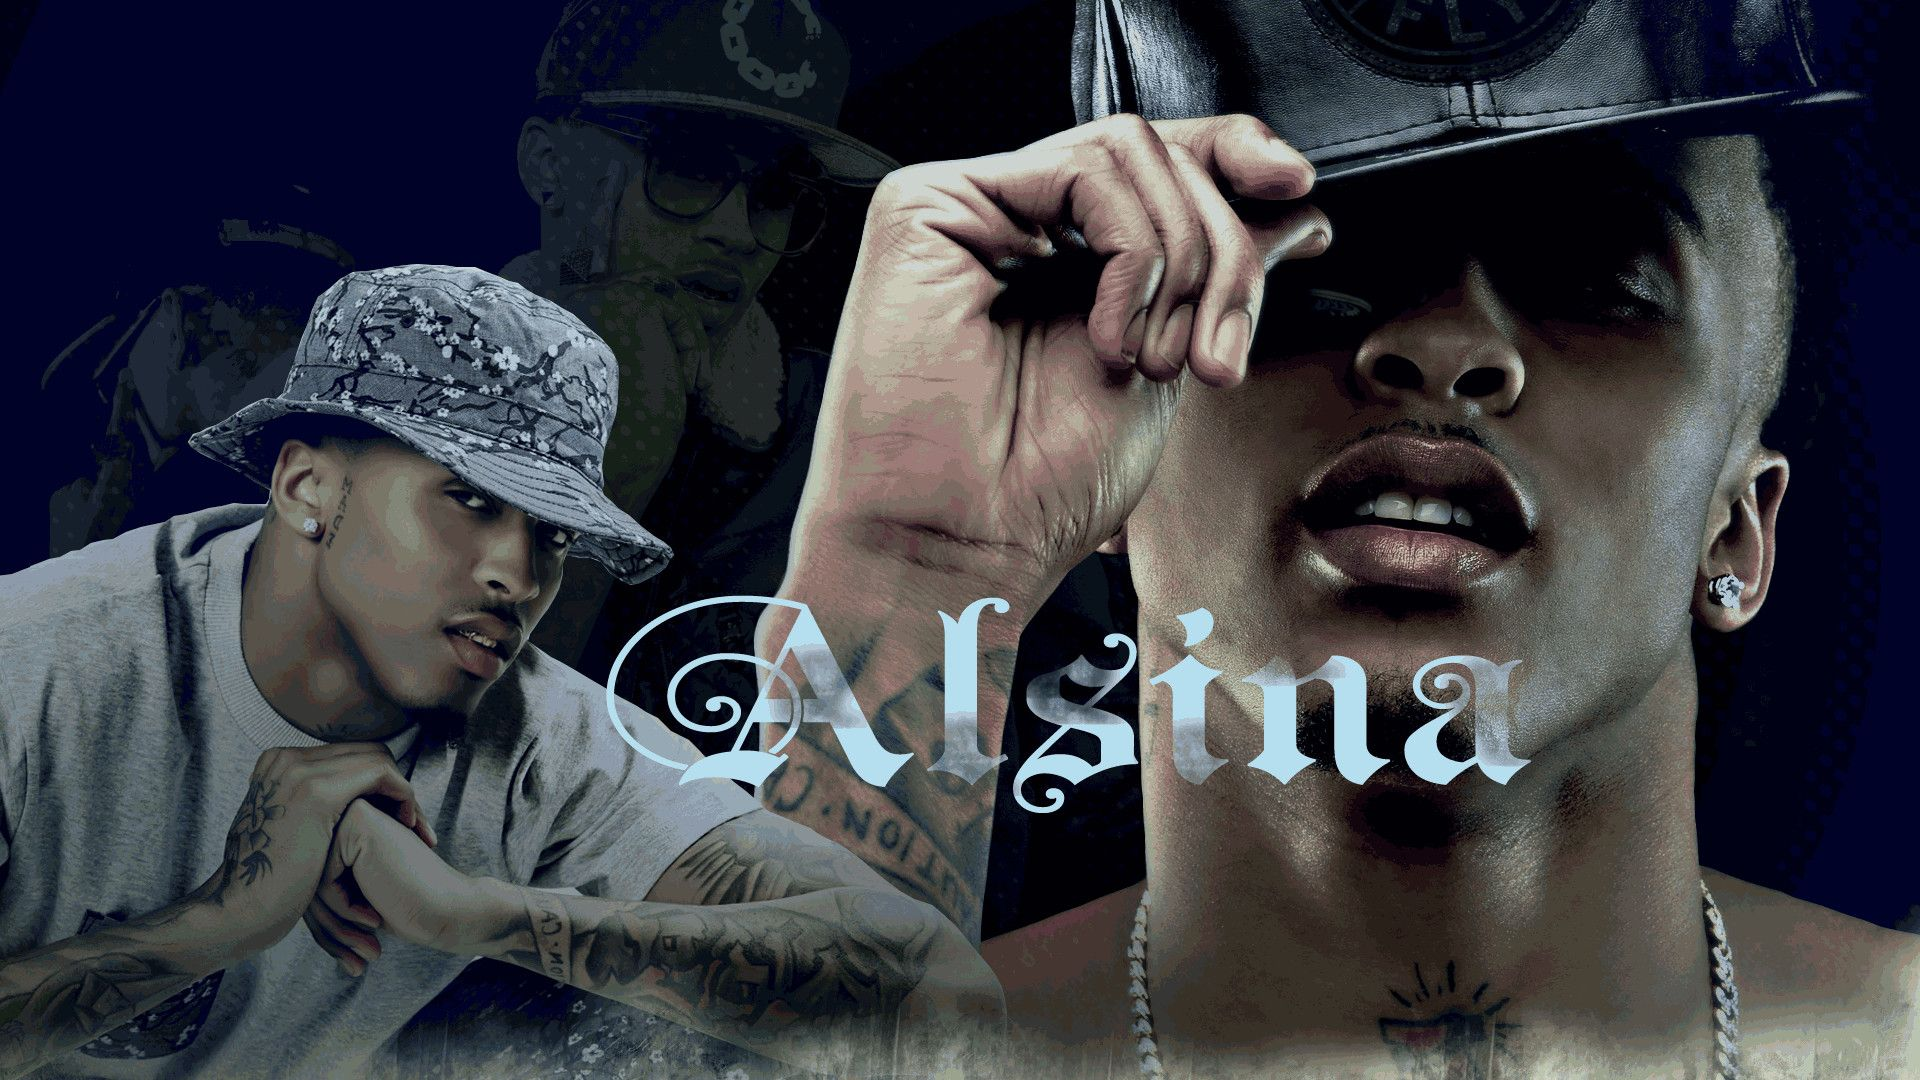 august alsina testimony album free download